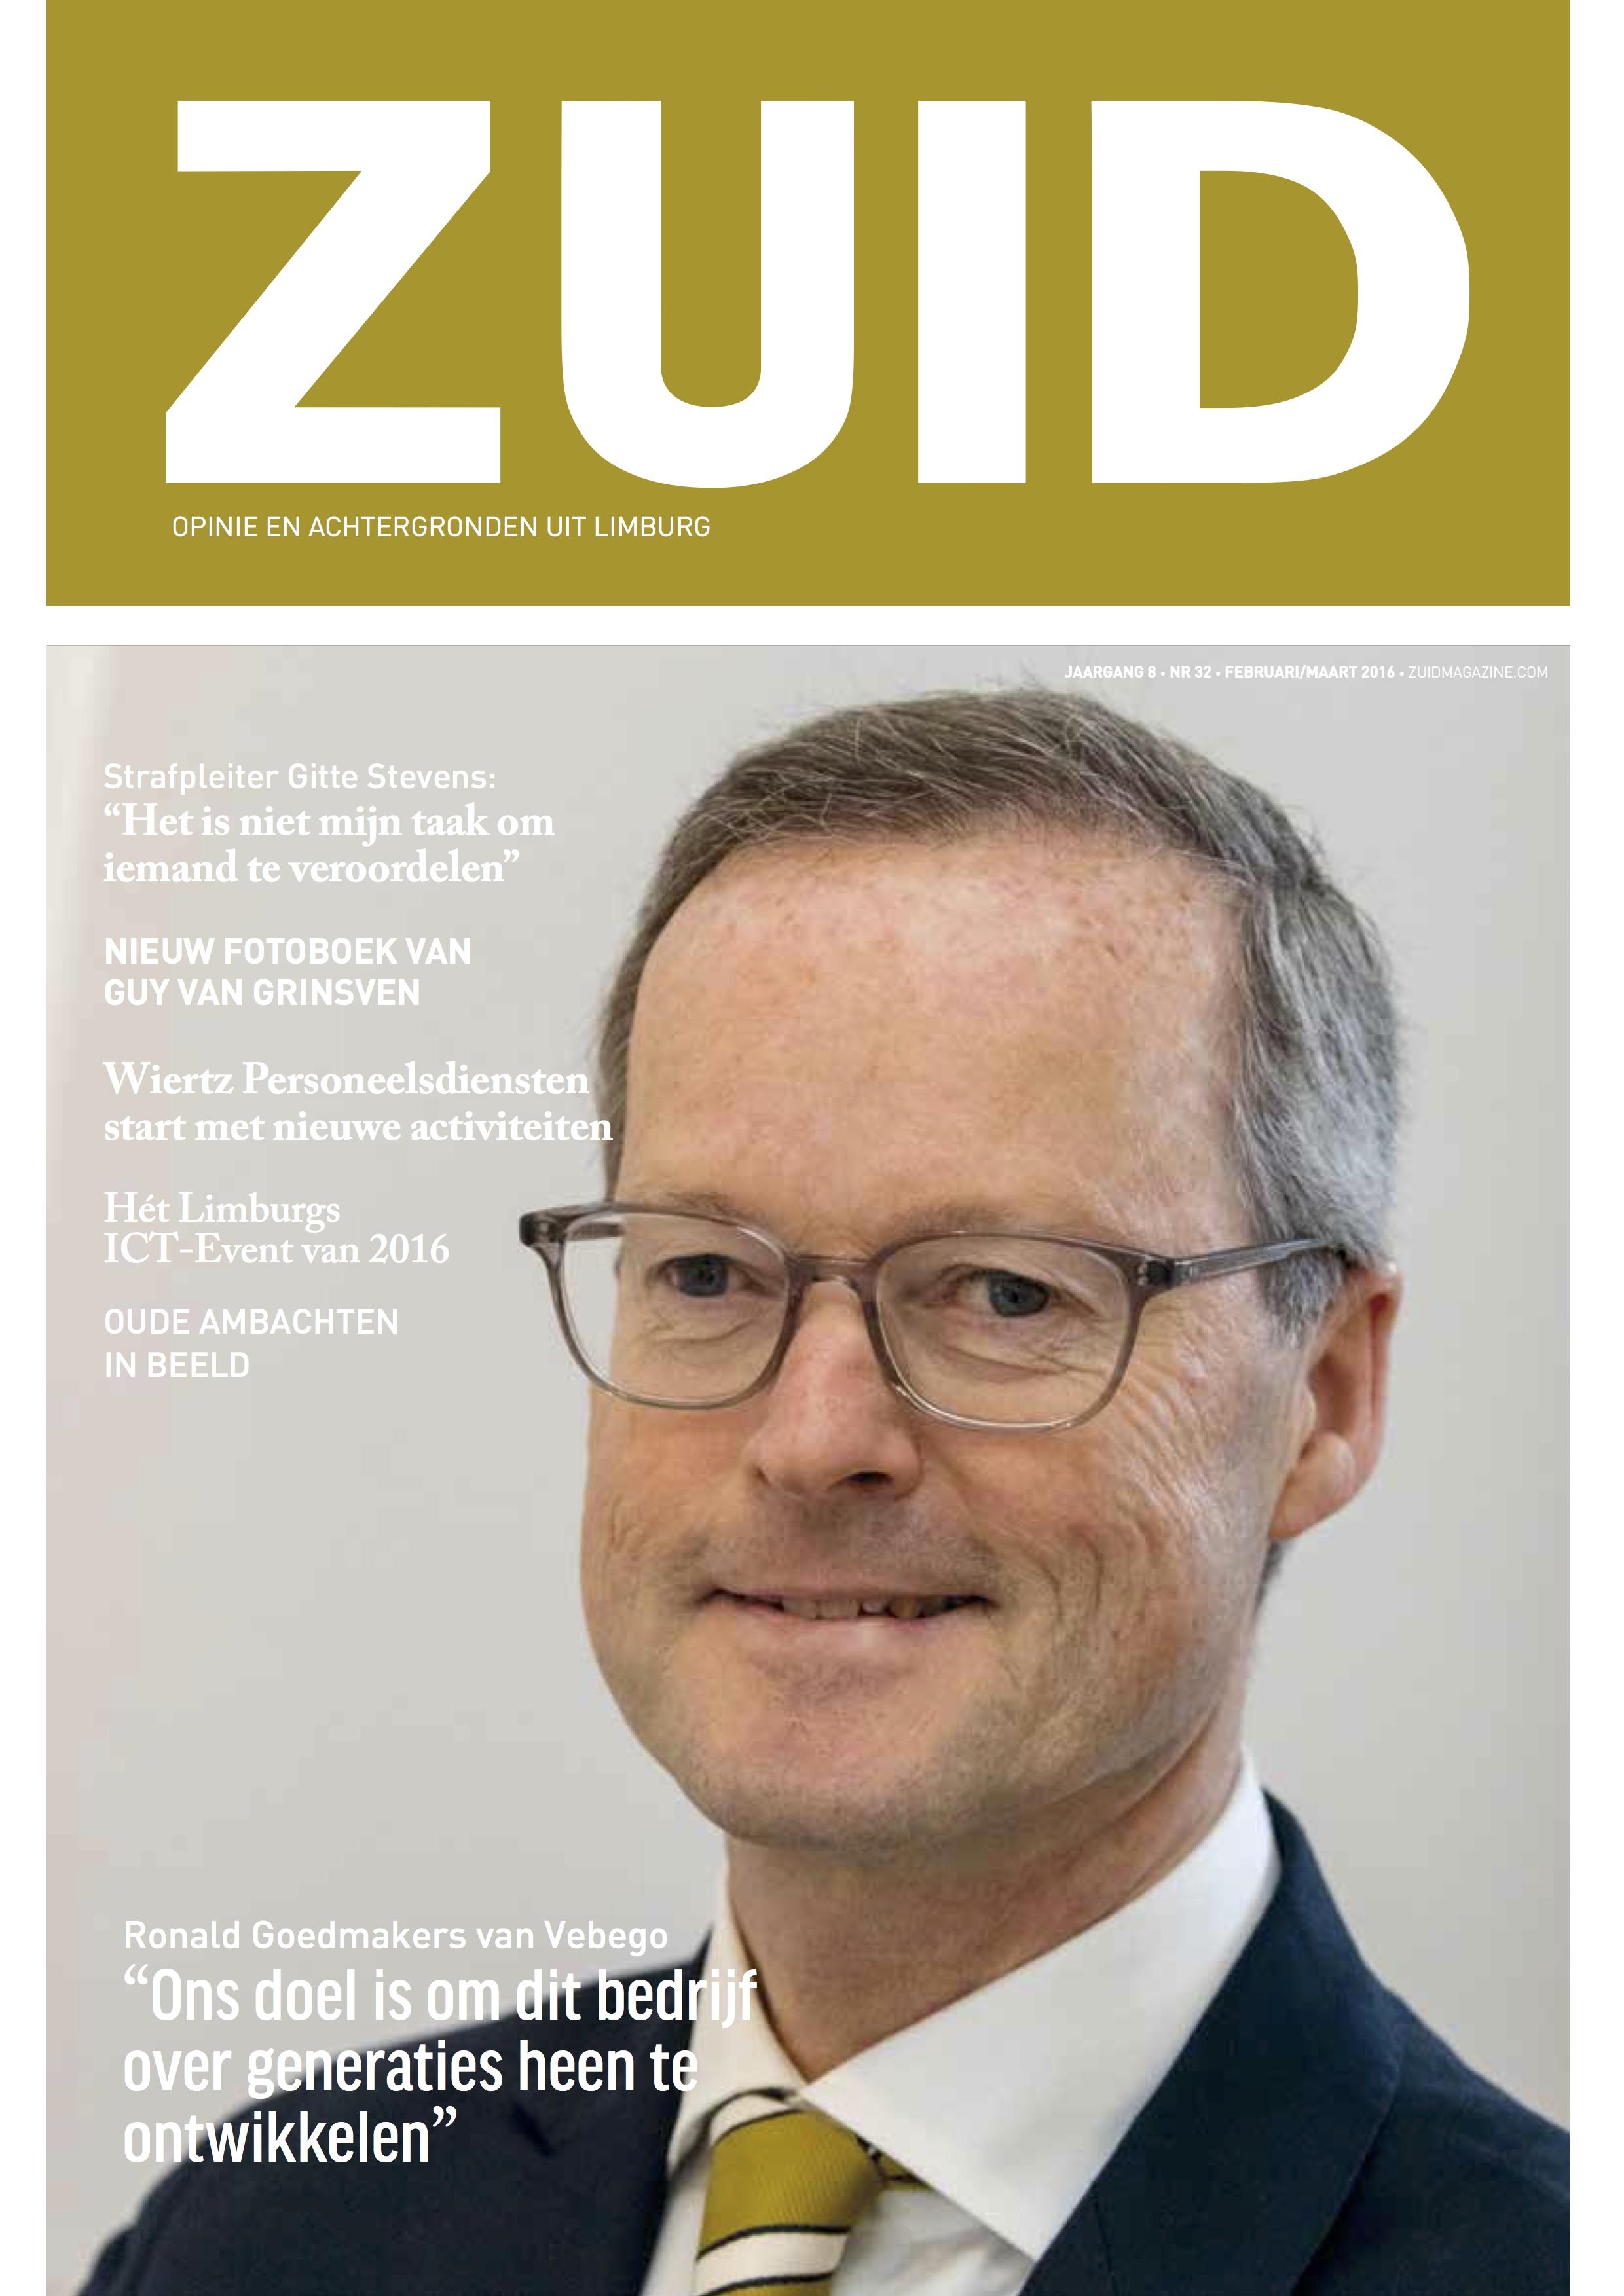 ZUID_MAGAZINE_FEBRUARI cover LR